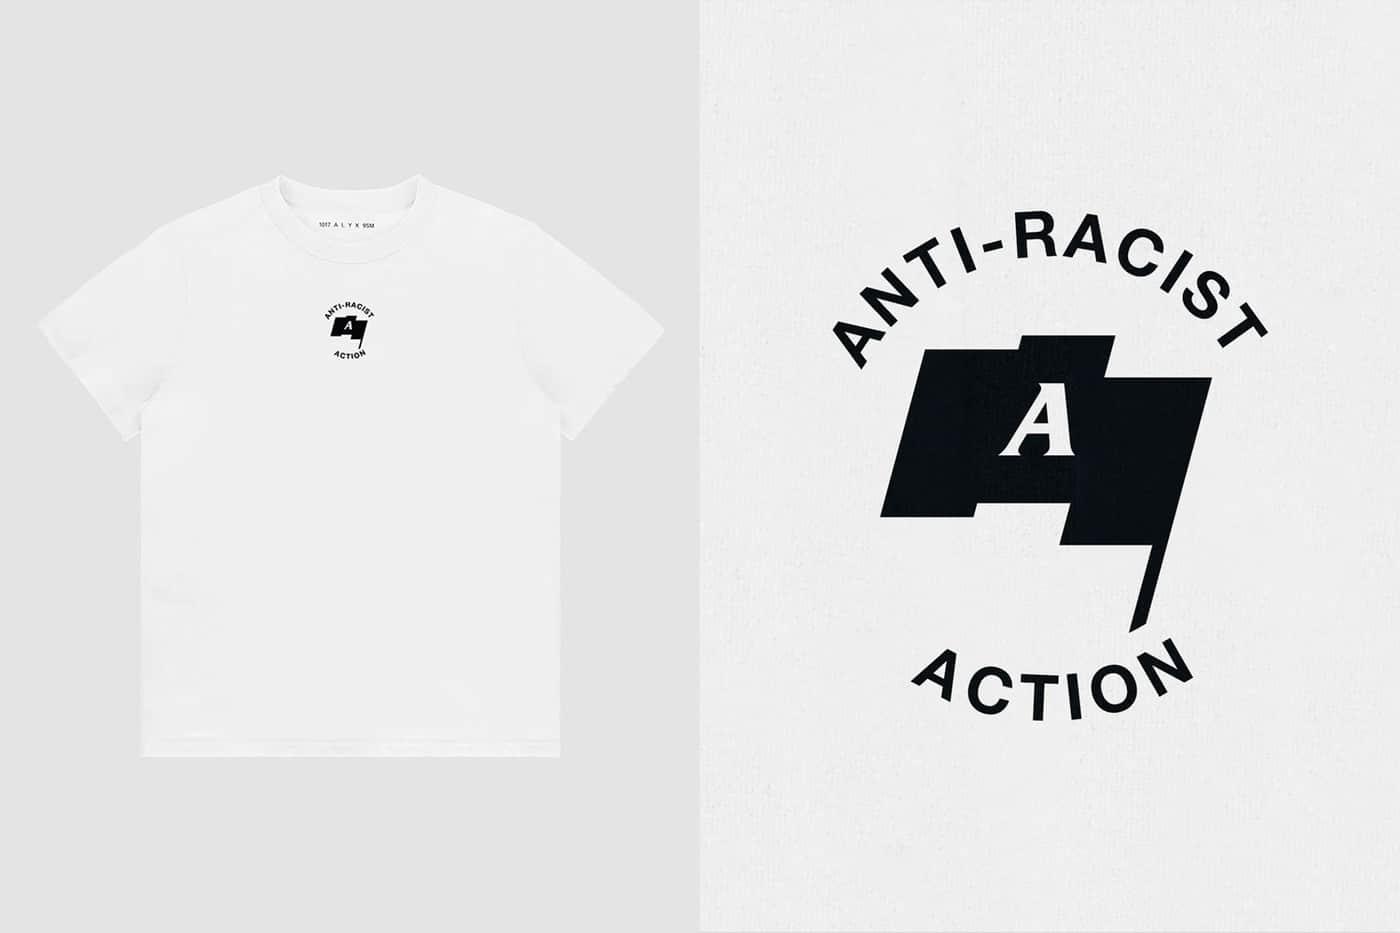 Anti-racism ALYX t-shirt